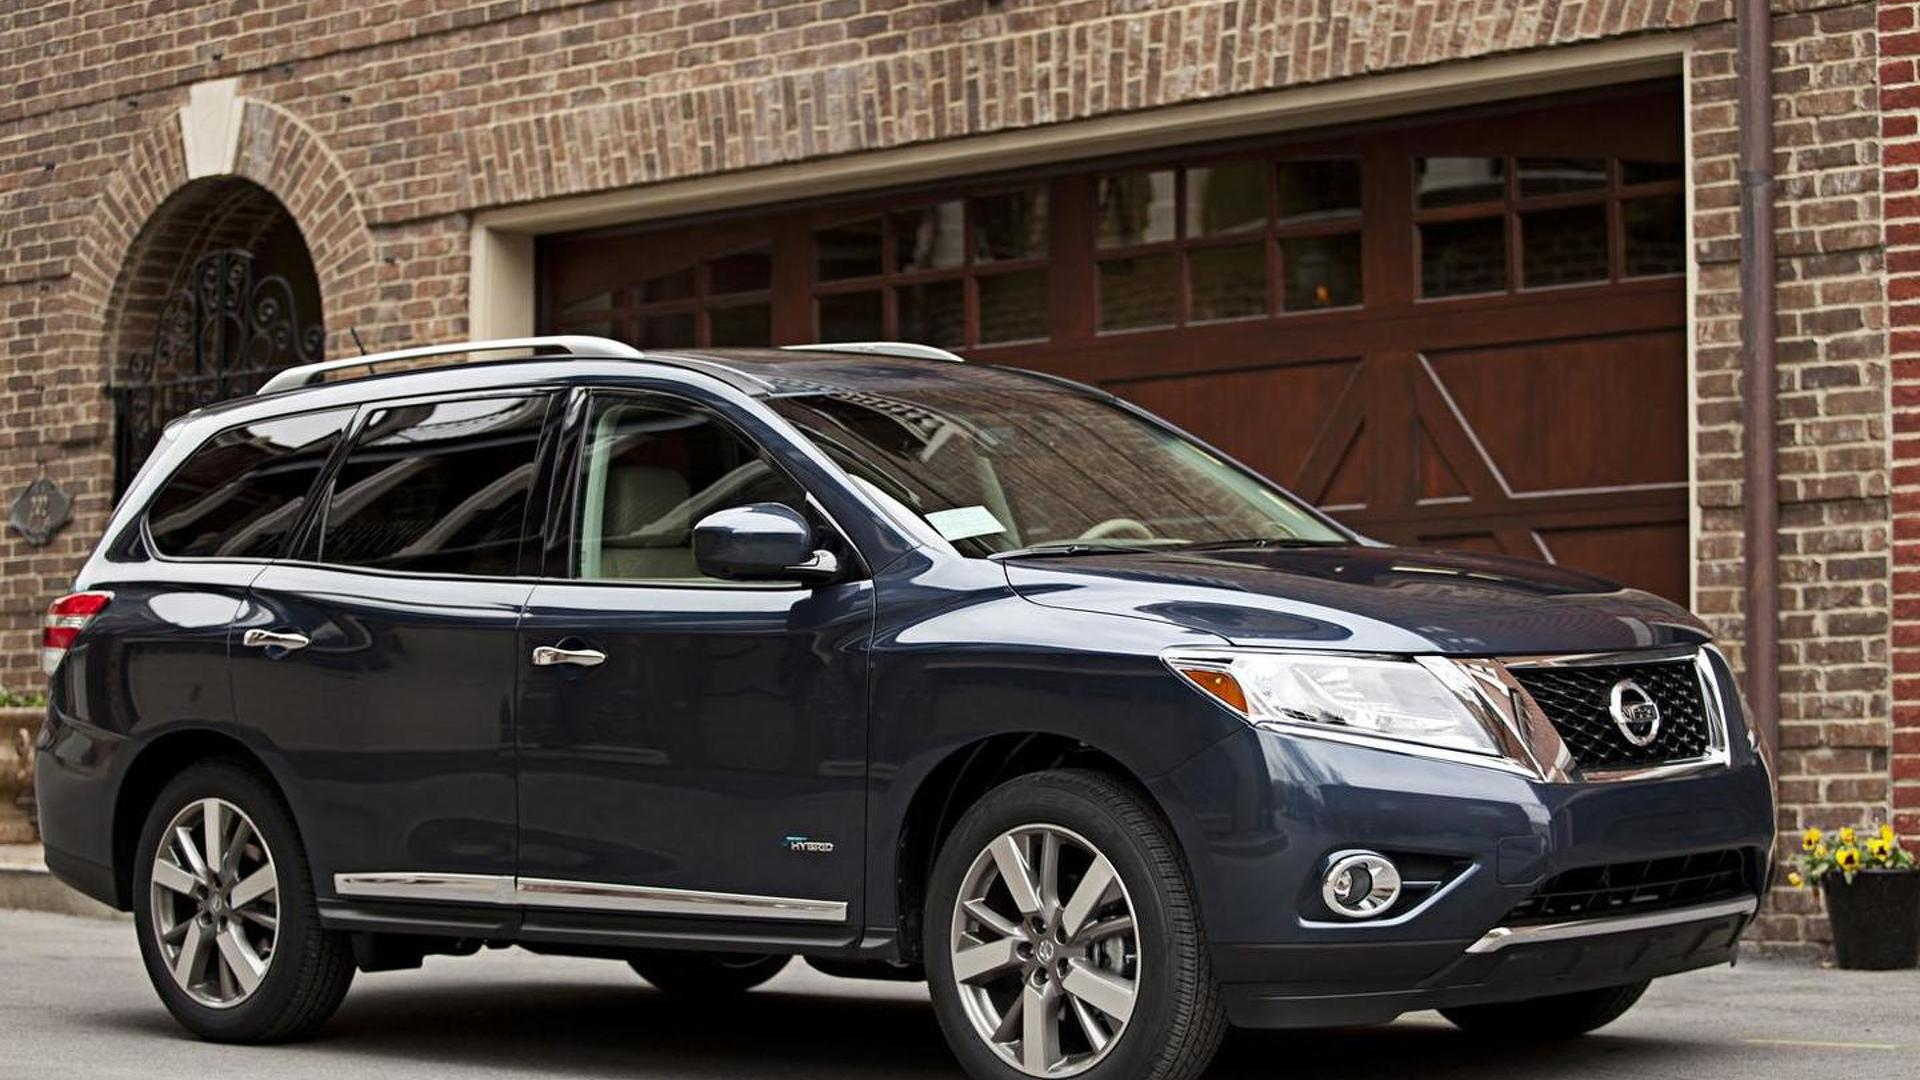 2014 Nissan Pathfinder Hybrid Bows In The Big Apple